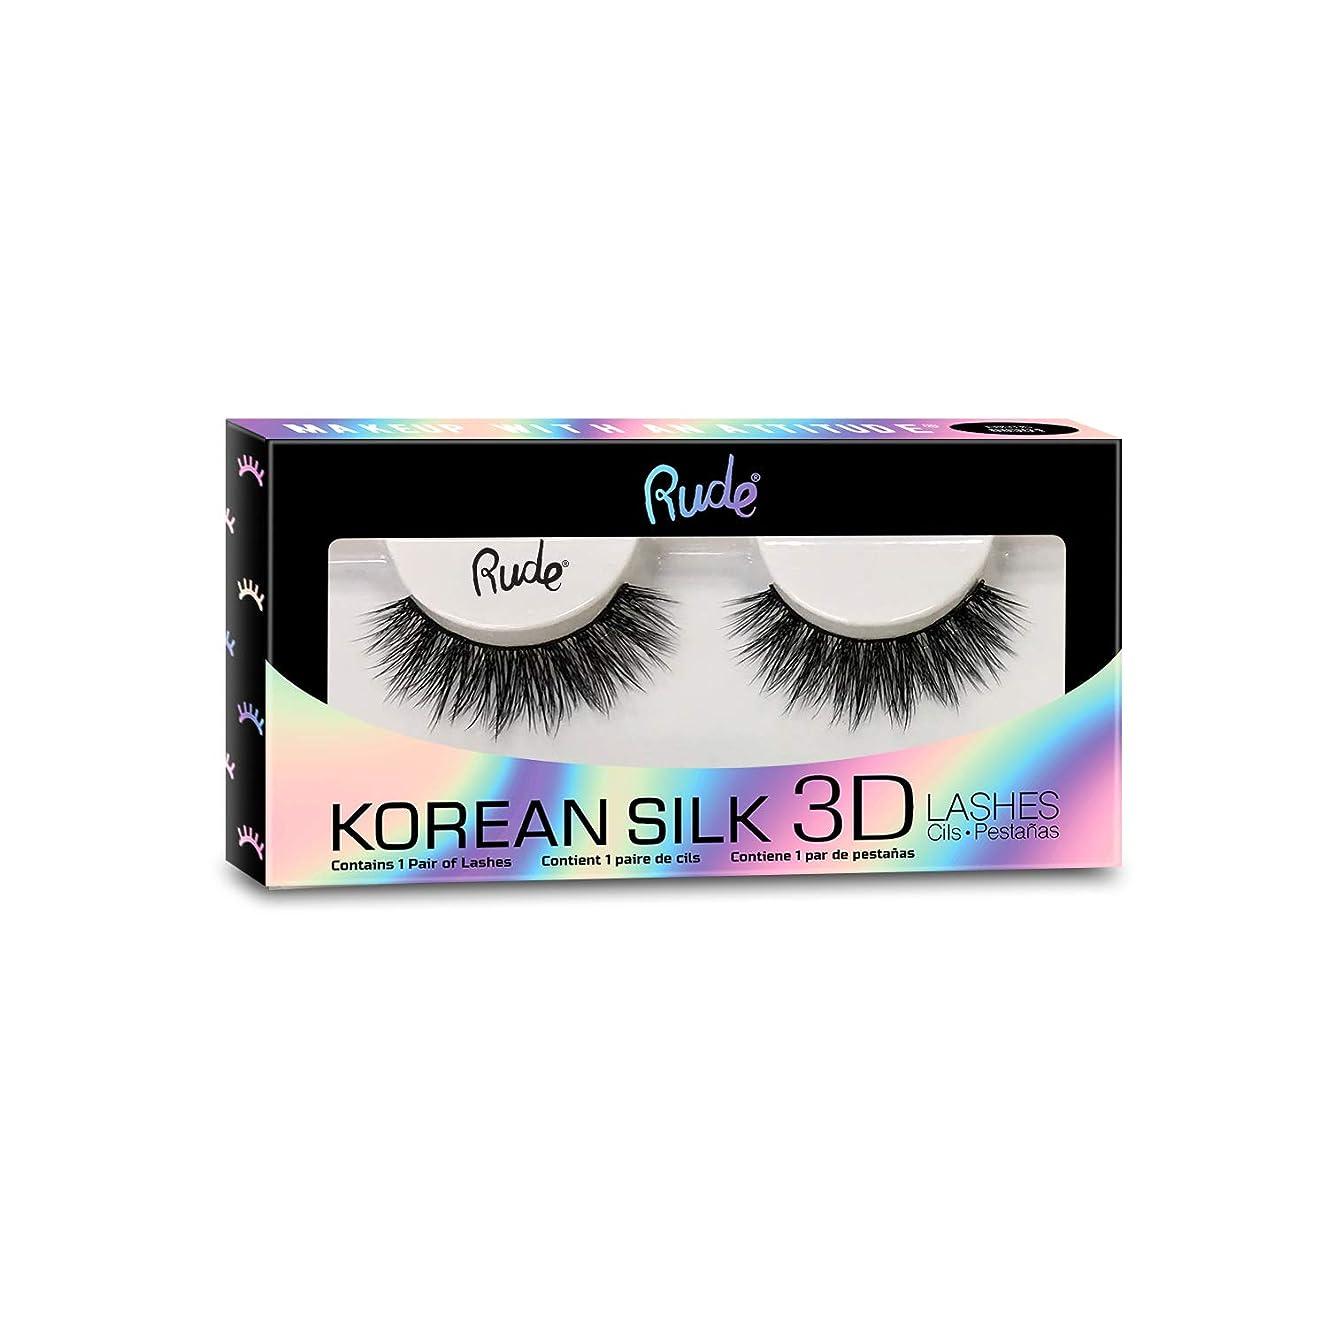 無限大豆擬人化RUDE? Korean Silk 3D Lashes - Erotic (並行輸入品)